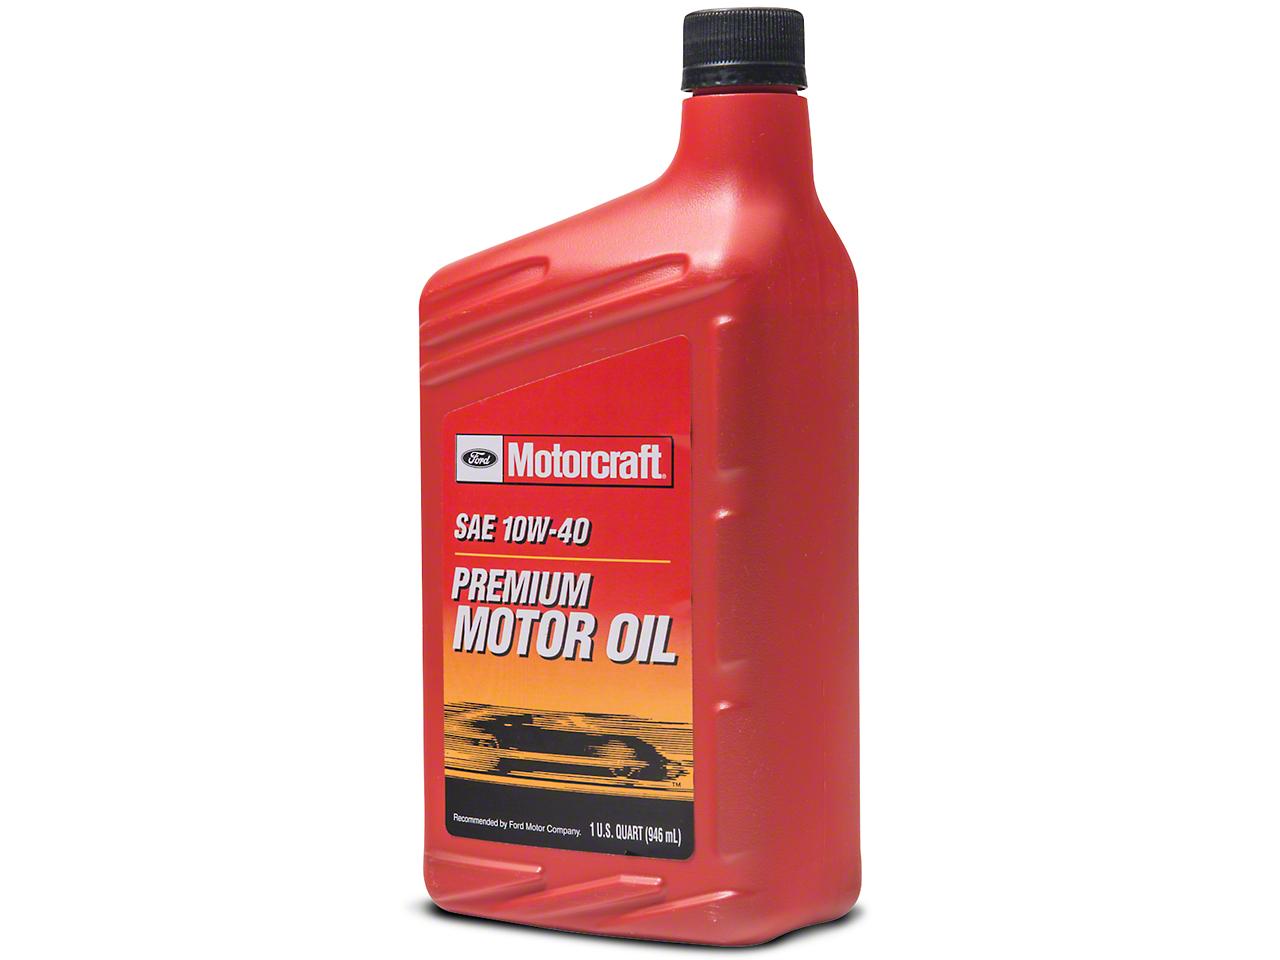 Ford Motorcraft 10W40 Motor Oil